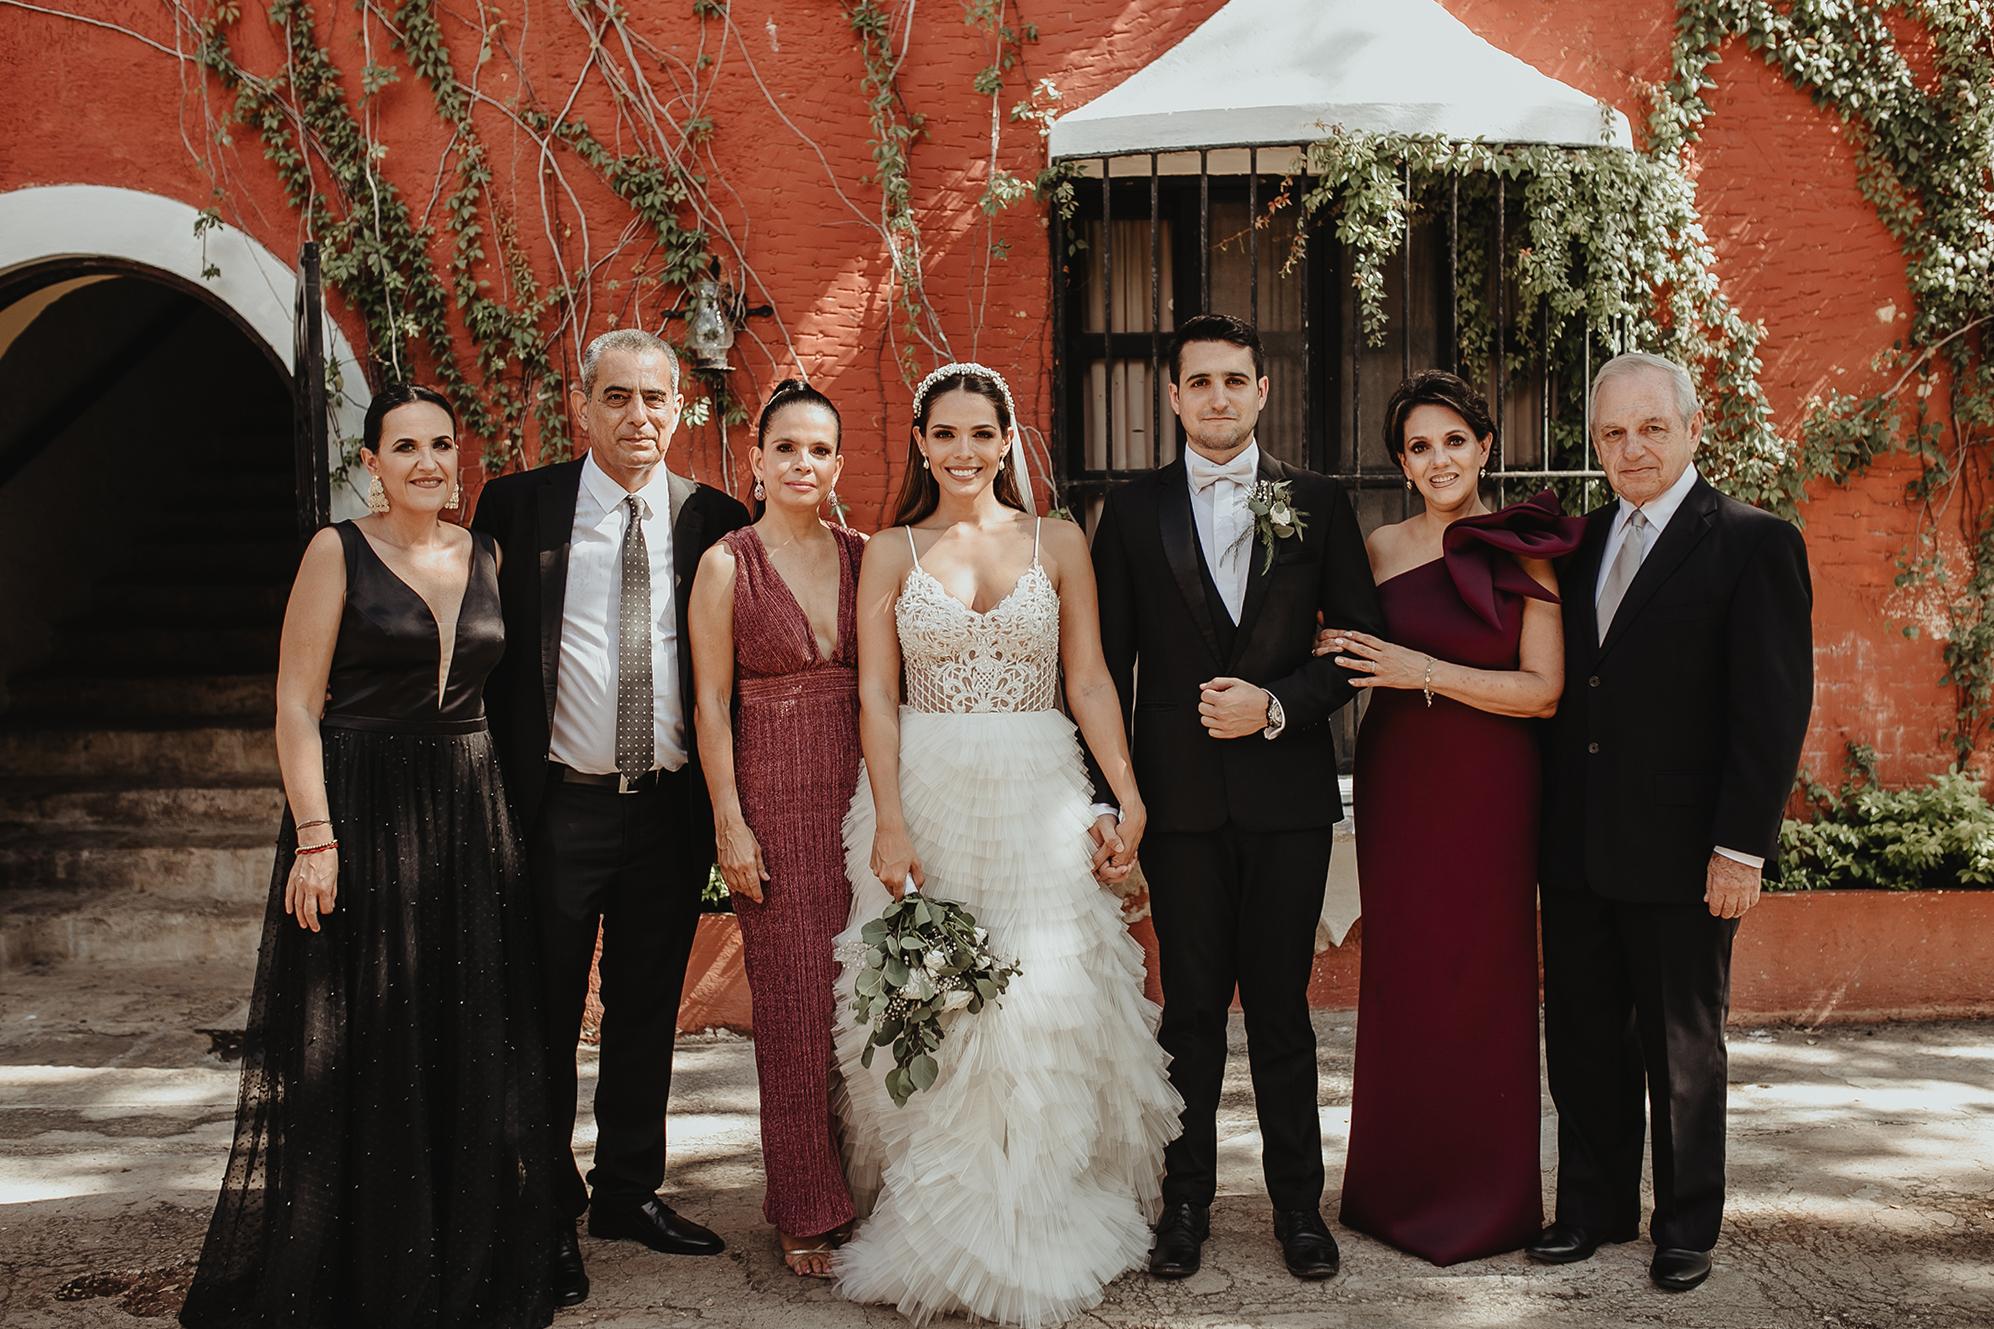 0501R&F__WeddingDestination_Weddingmerida_BodaMexico_FotografoDeBodas_FabrizioSimoneenFotografo.jpg